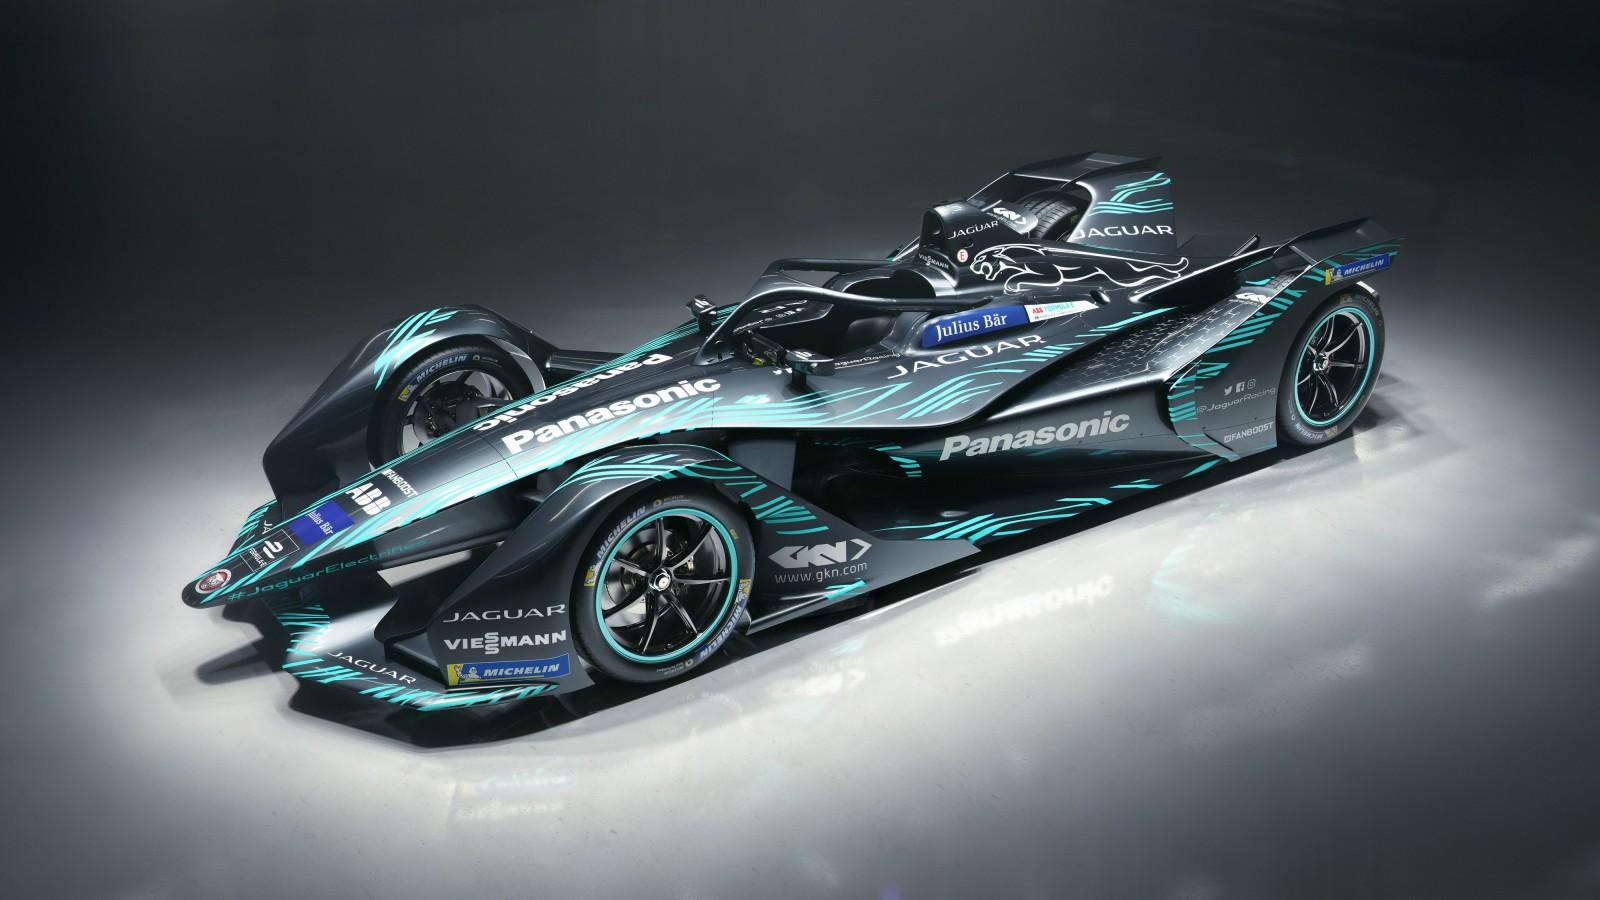 2018 jaguar i type electric formula e car 4k wallpaper - Cars hd wallpapers for laptop ...